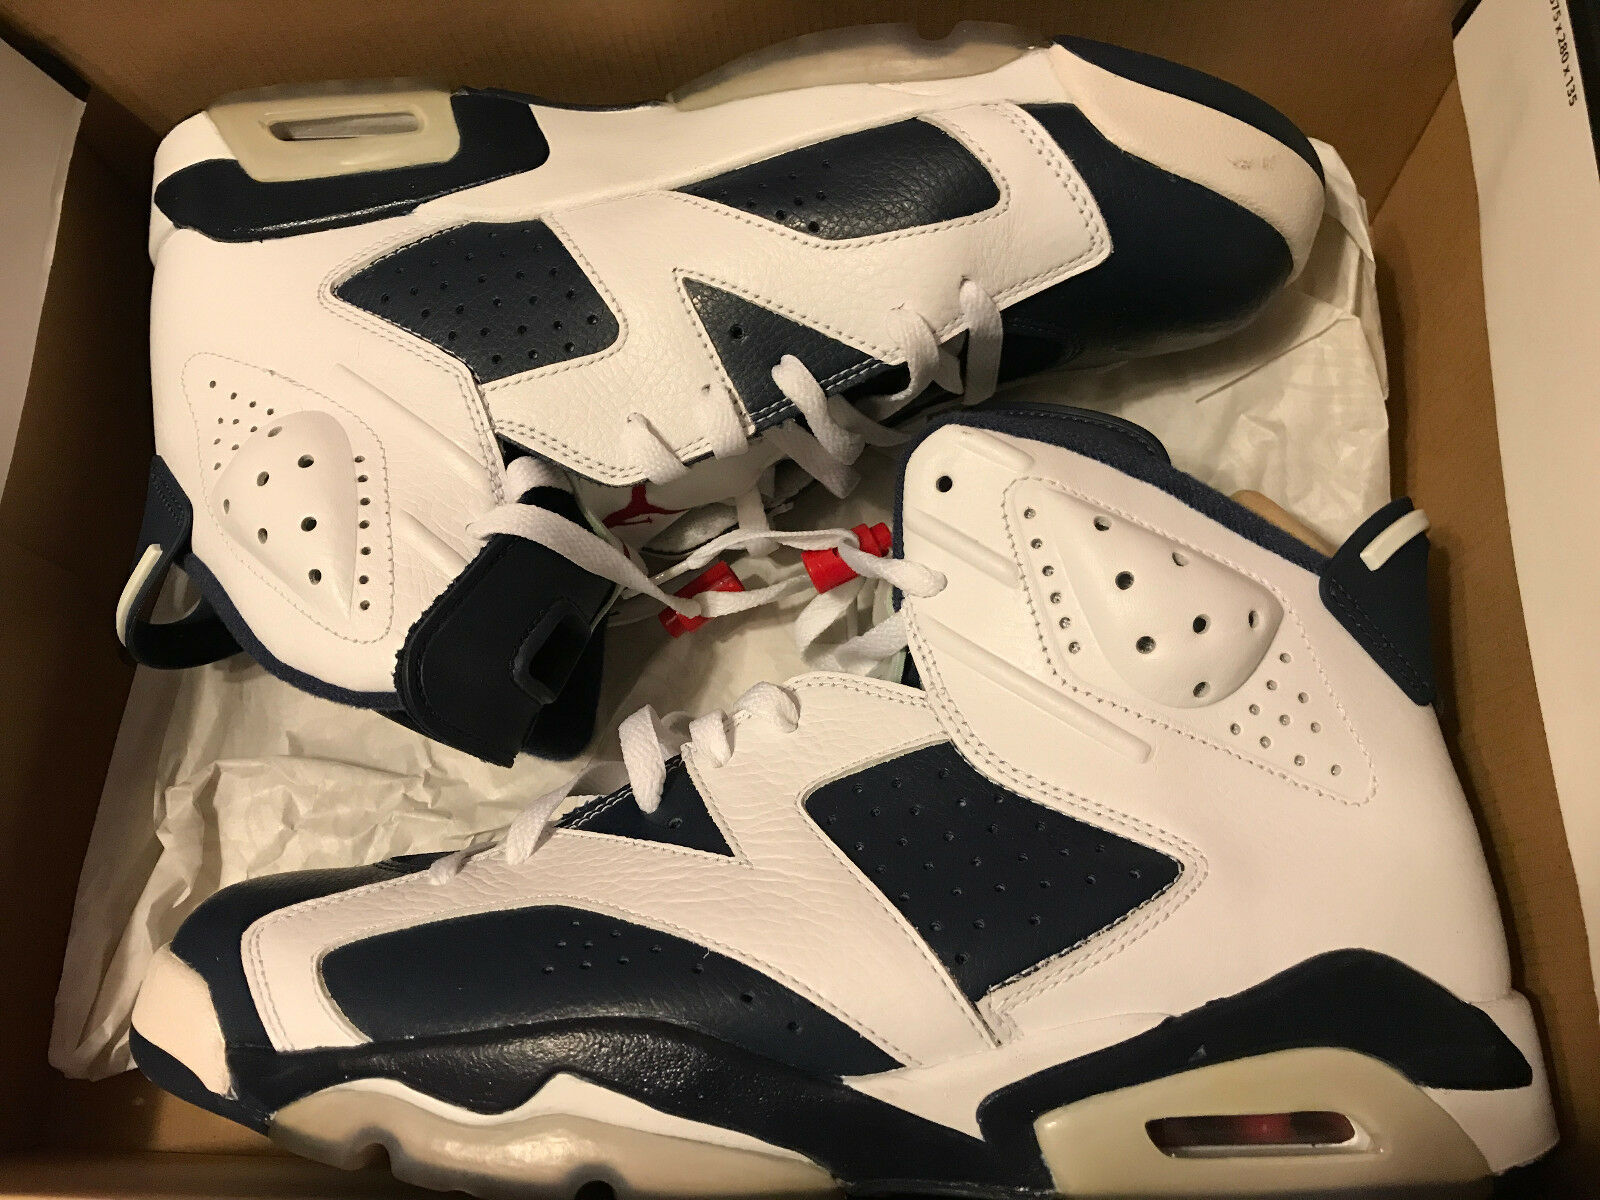 USED Nike Air Jordan Retro VI 6 Olympic Size 12